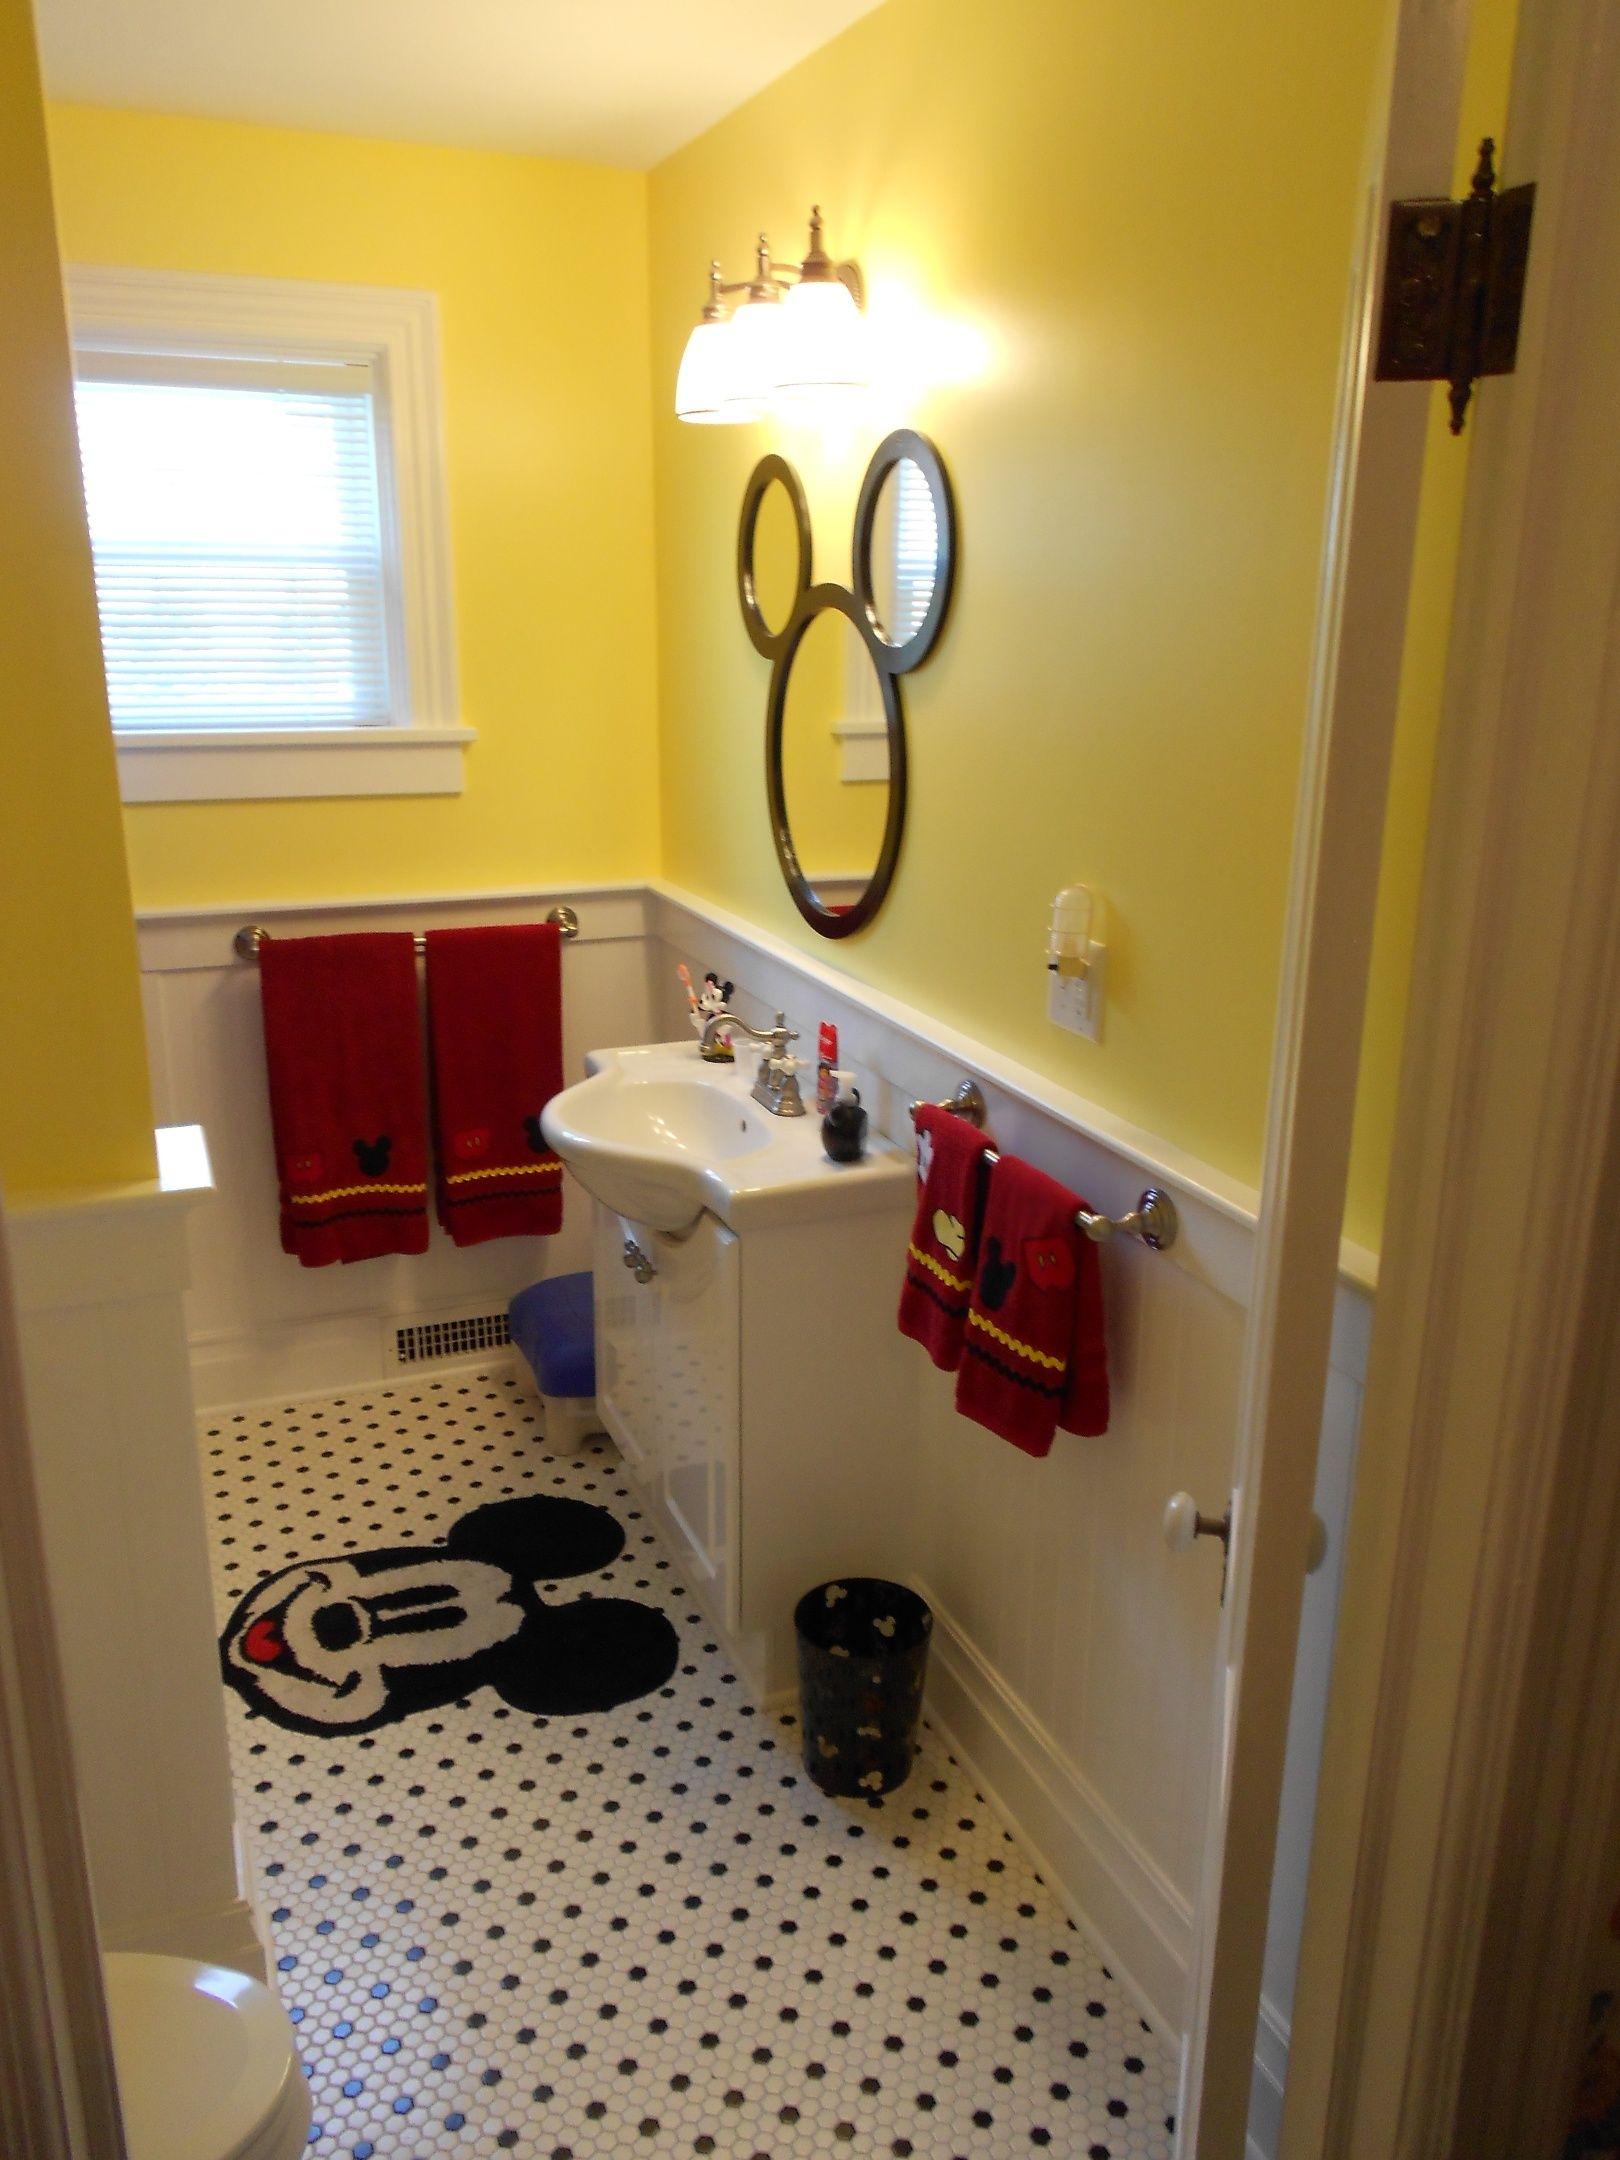 Original Pinner said Our newly renovated Mickey Bathroom